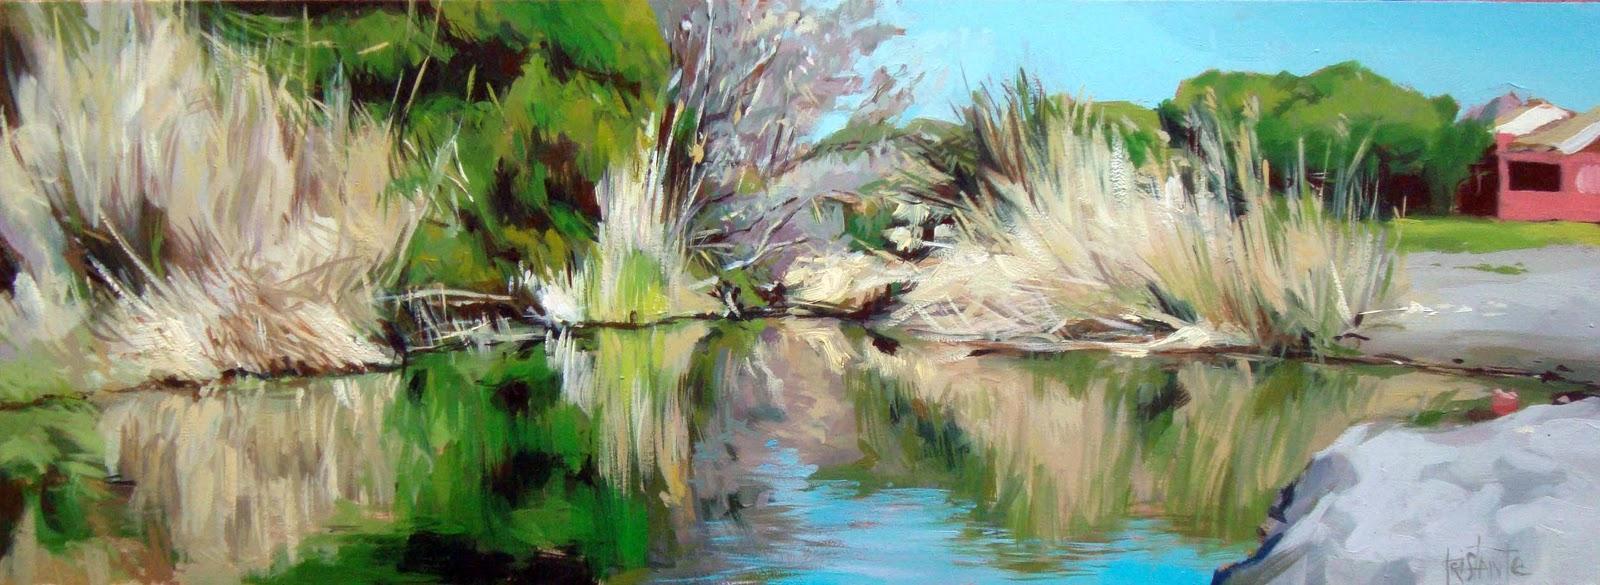 """Quiet waters"" original fine art by Víctor Tristante"